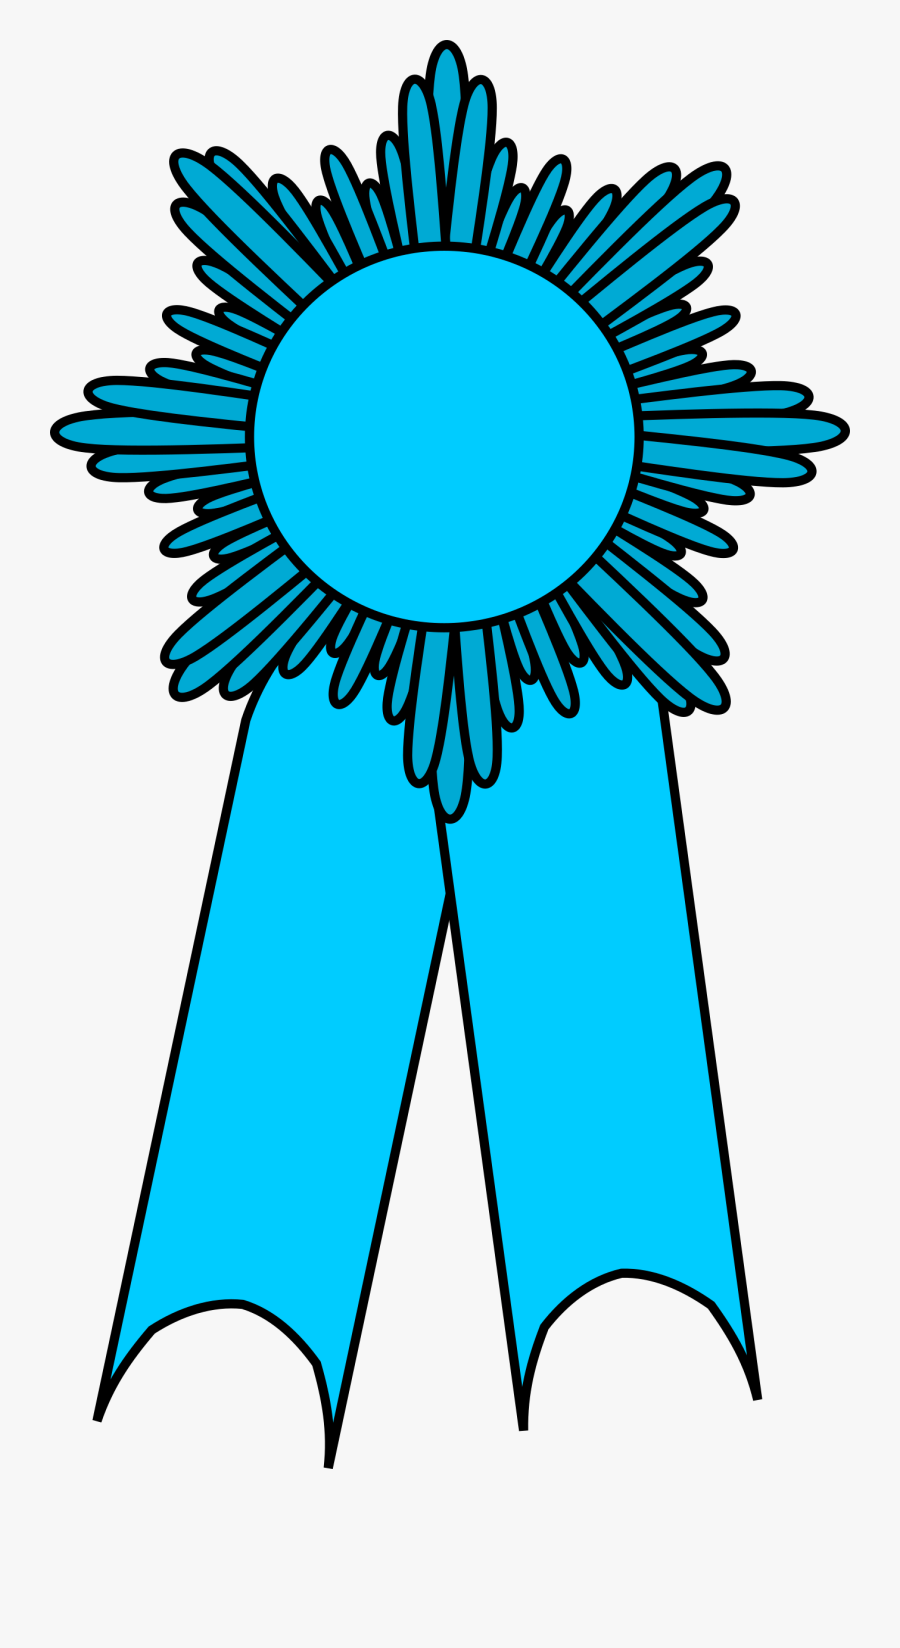 Transparent Prizes Clipart - Light Purple Ribbon Award, Transparent Clipart